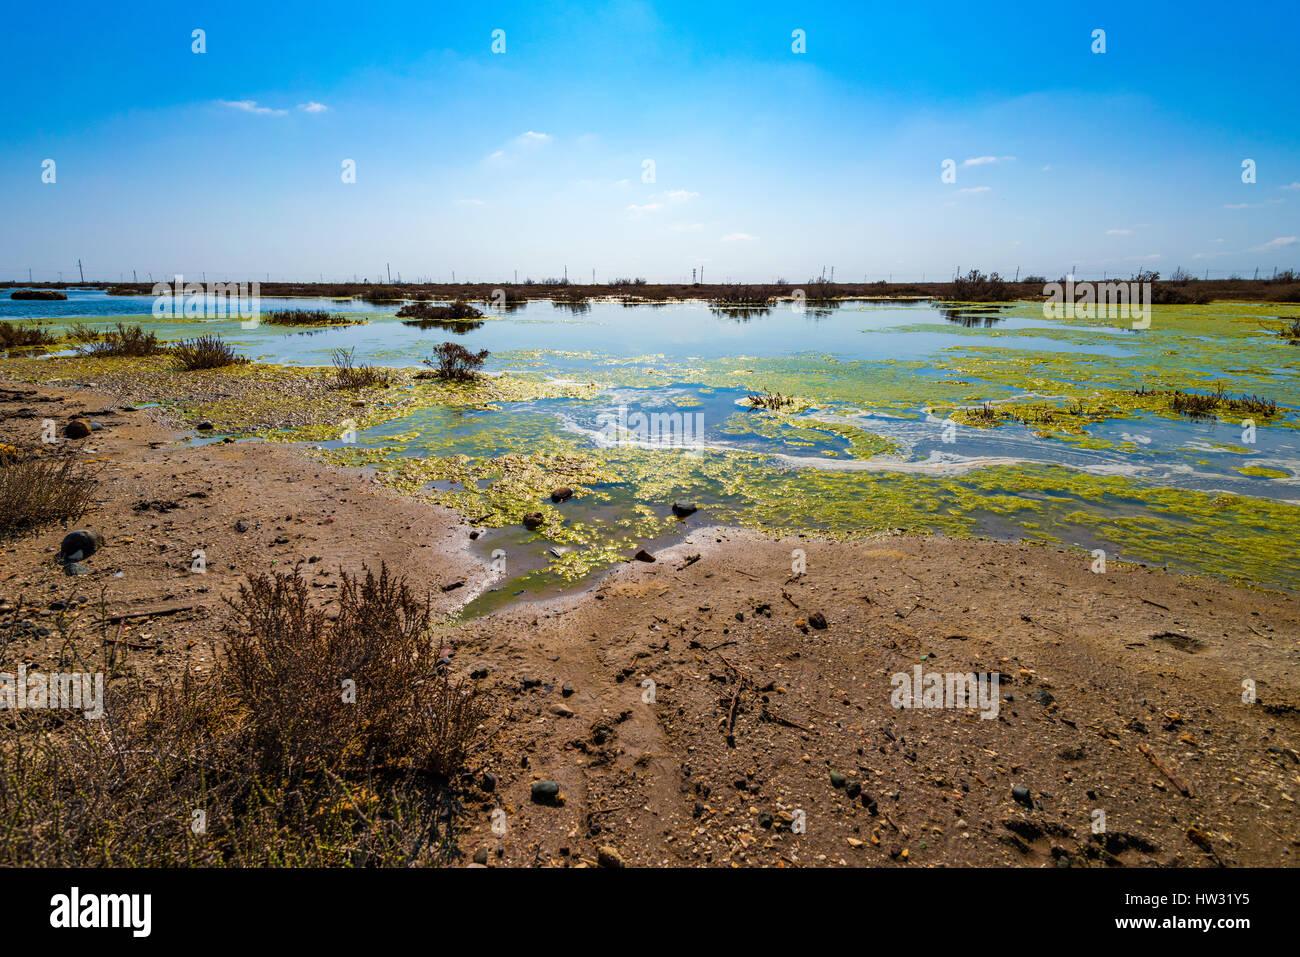 Contaminated lake - Stock Image